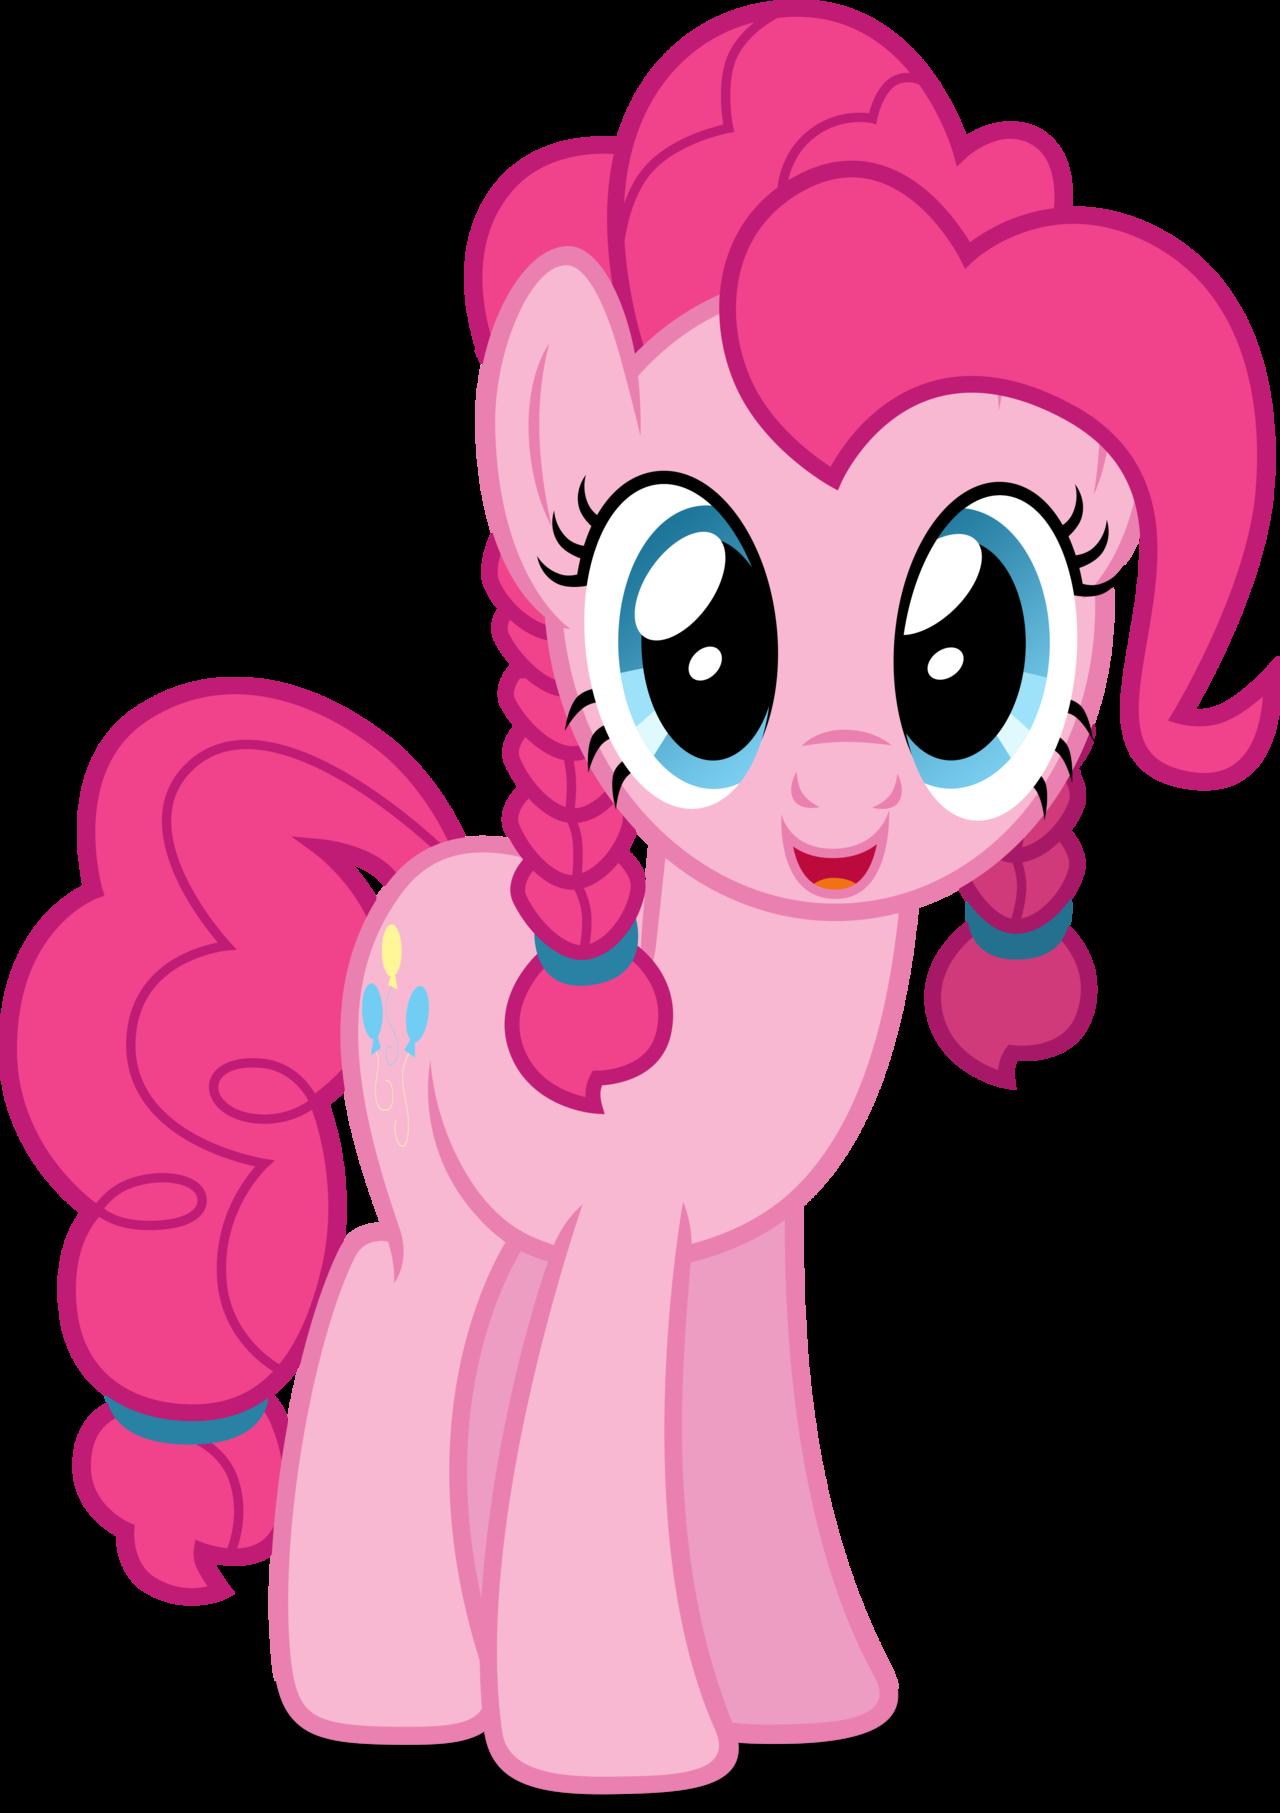 1405419455 Tumblr Mlo0k0ejar1rpb34po1 1280 Png 1280 1813 Hasbro My Little Pony My Little Pony Friendship Pinkie Pie